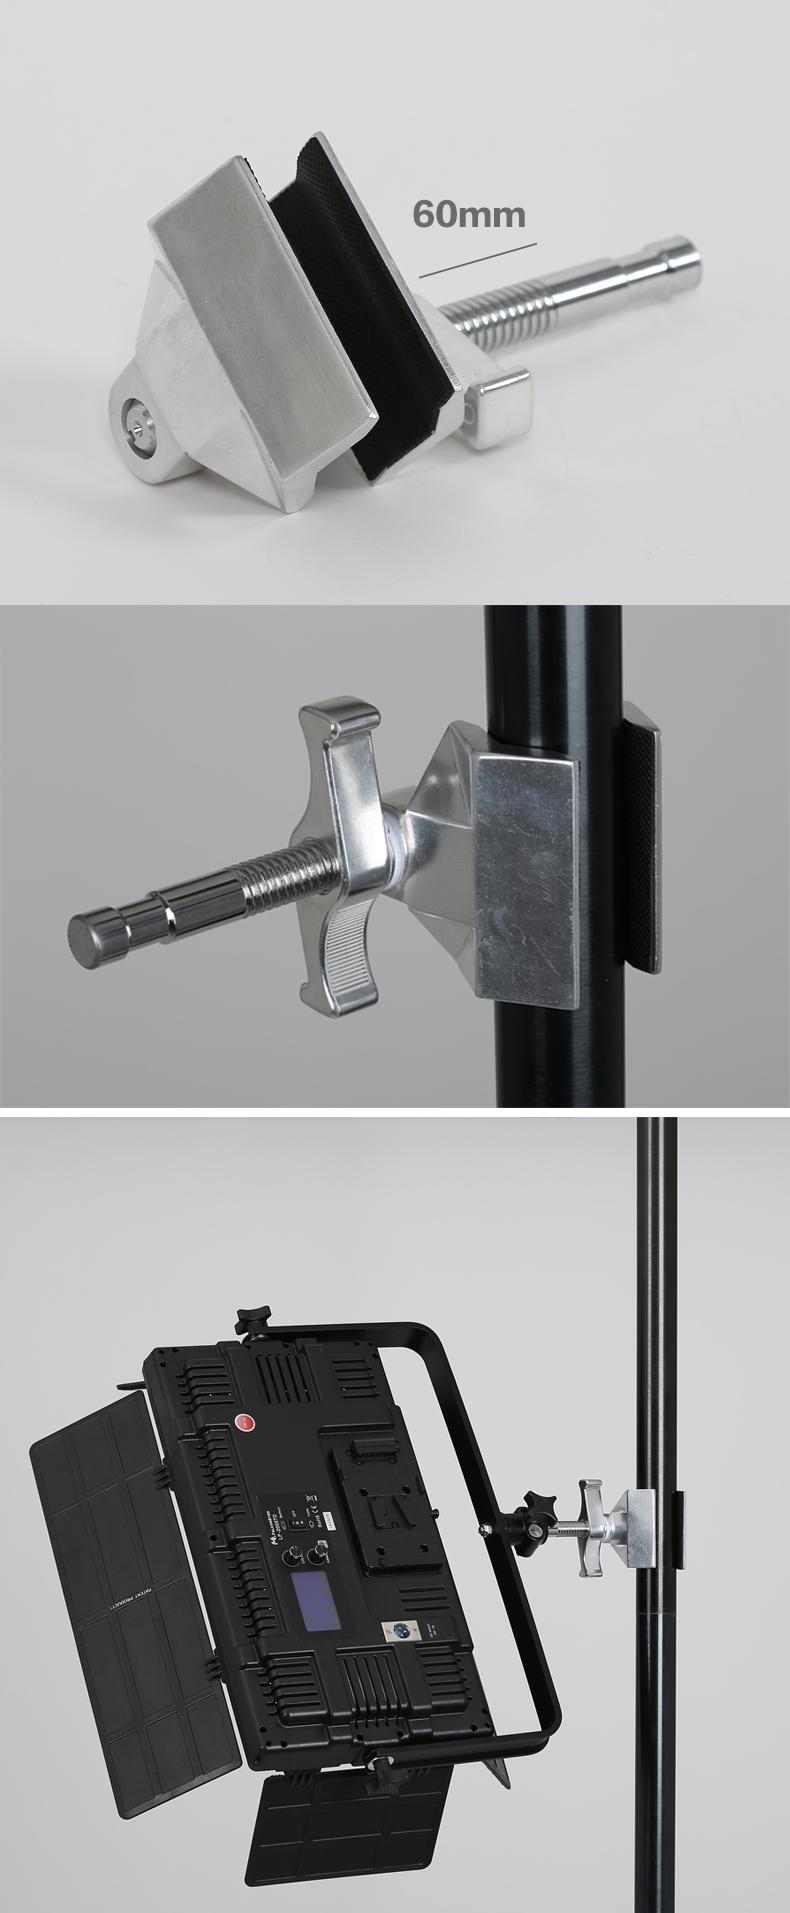 2018 Hot sale 15-60mm JCL-01S Heavy Metal C Type Clamp U Clip Bracket for Photo Studio Light Stand Camera Flash Accessories 9